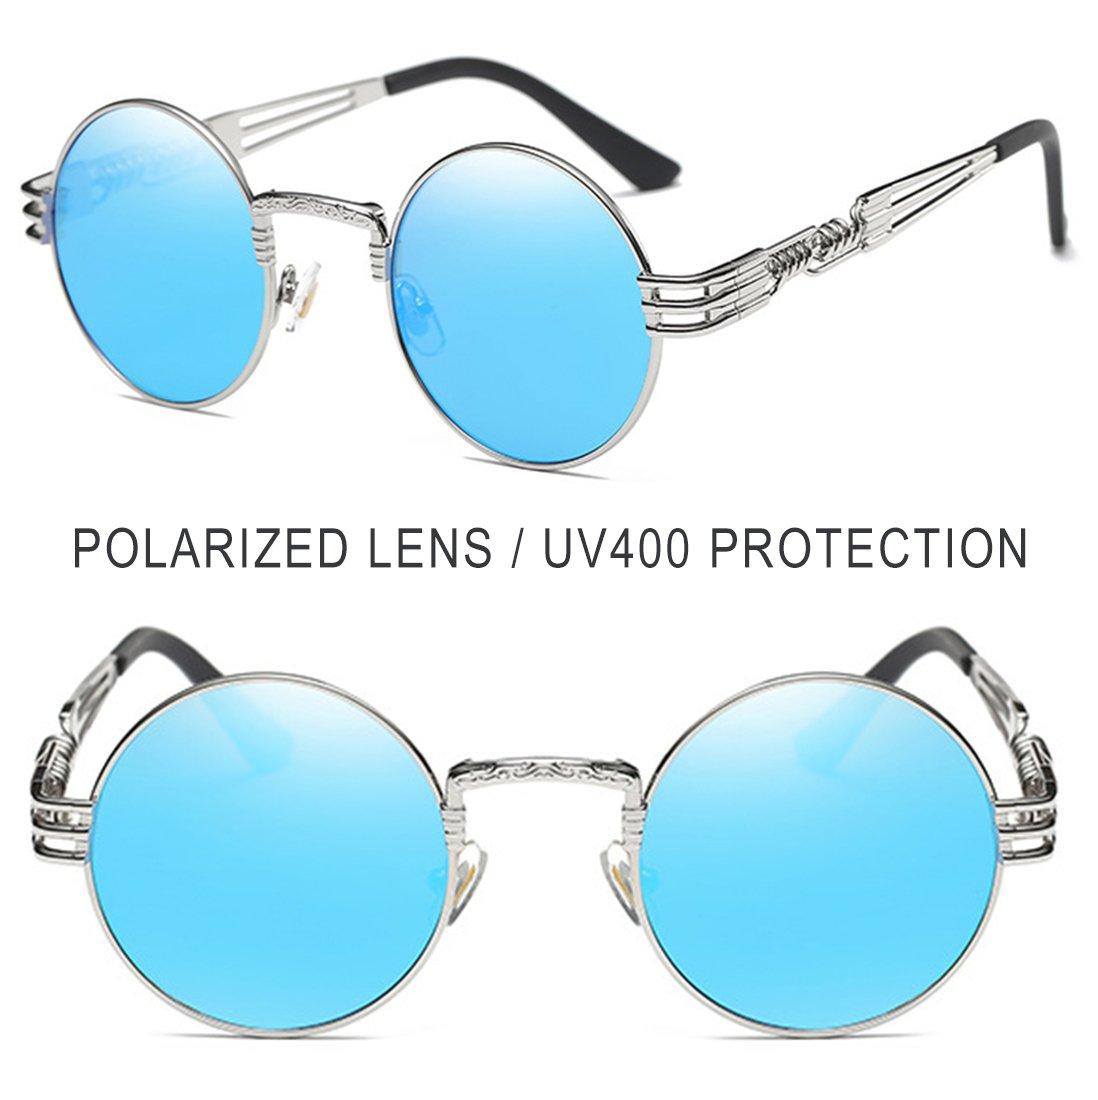 d34d6c88e5 Joopin-Round Retro Polaroid Sunglasses Driving Polarized Glasses Men  Steampunk (Blue Punk) - E4056-09   Sunglasses   Clothing